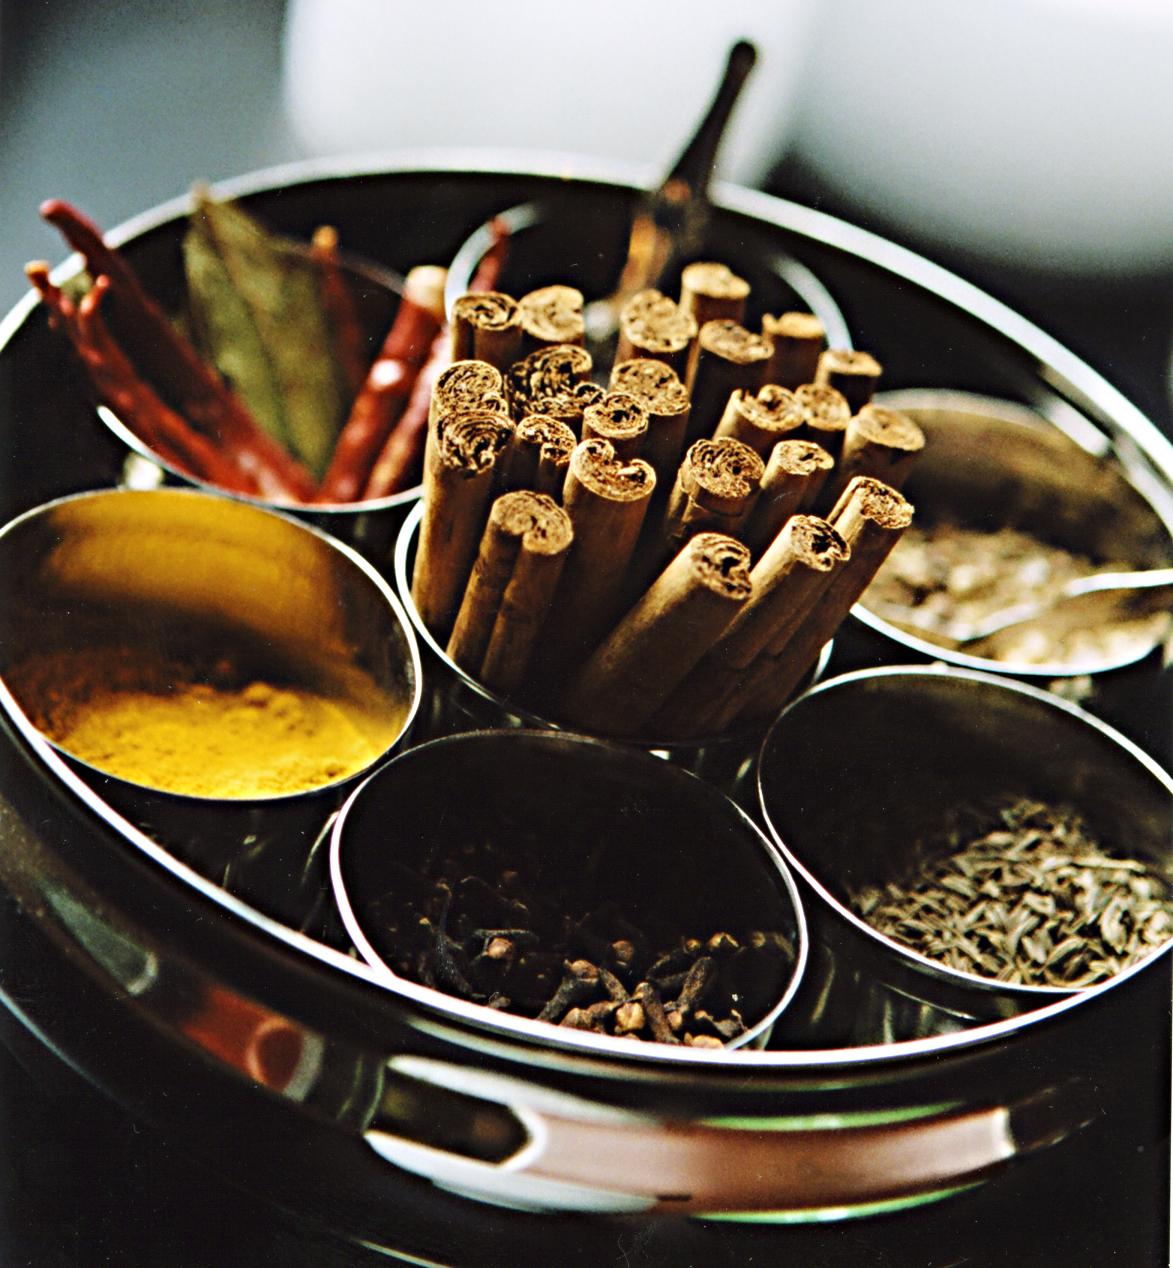 Spice of India  © kris krug/Flickr